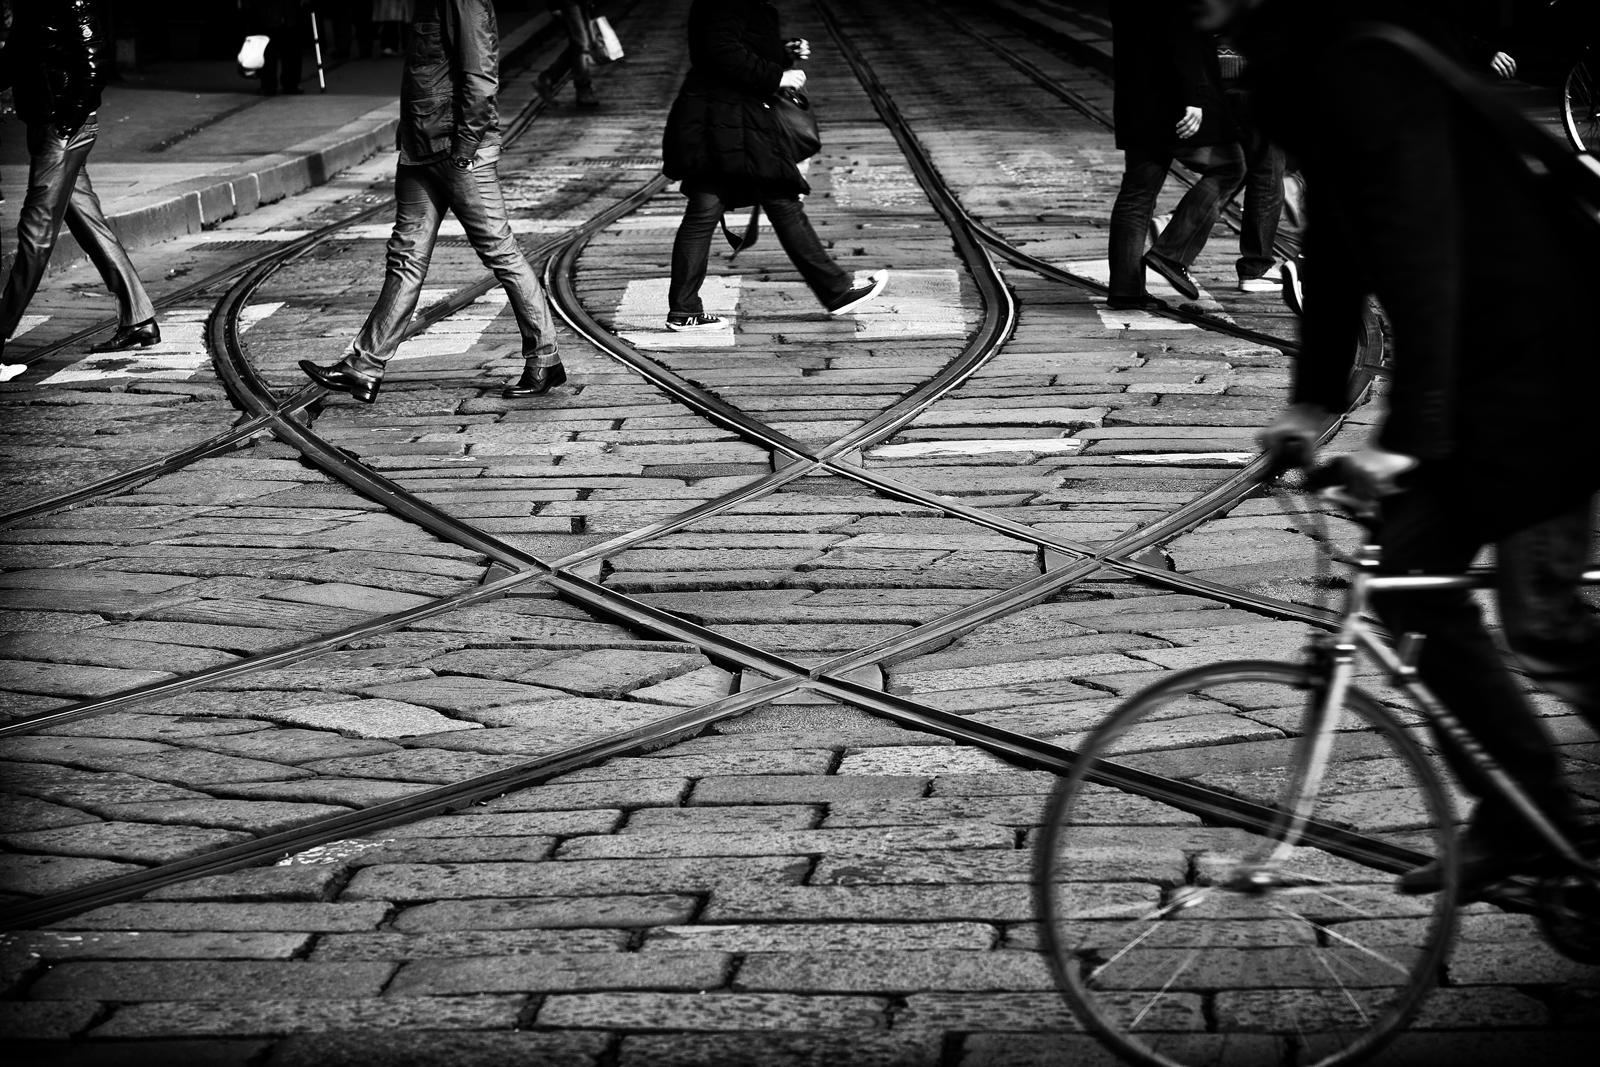 Crossing of life